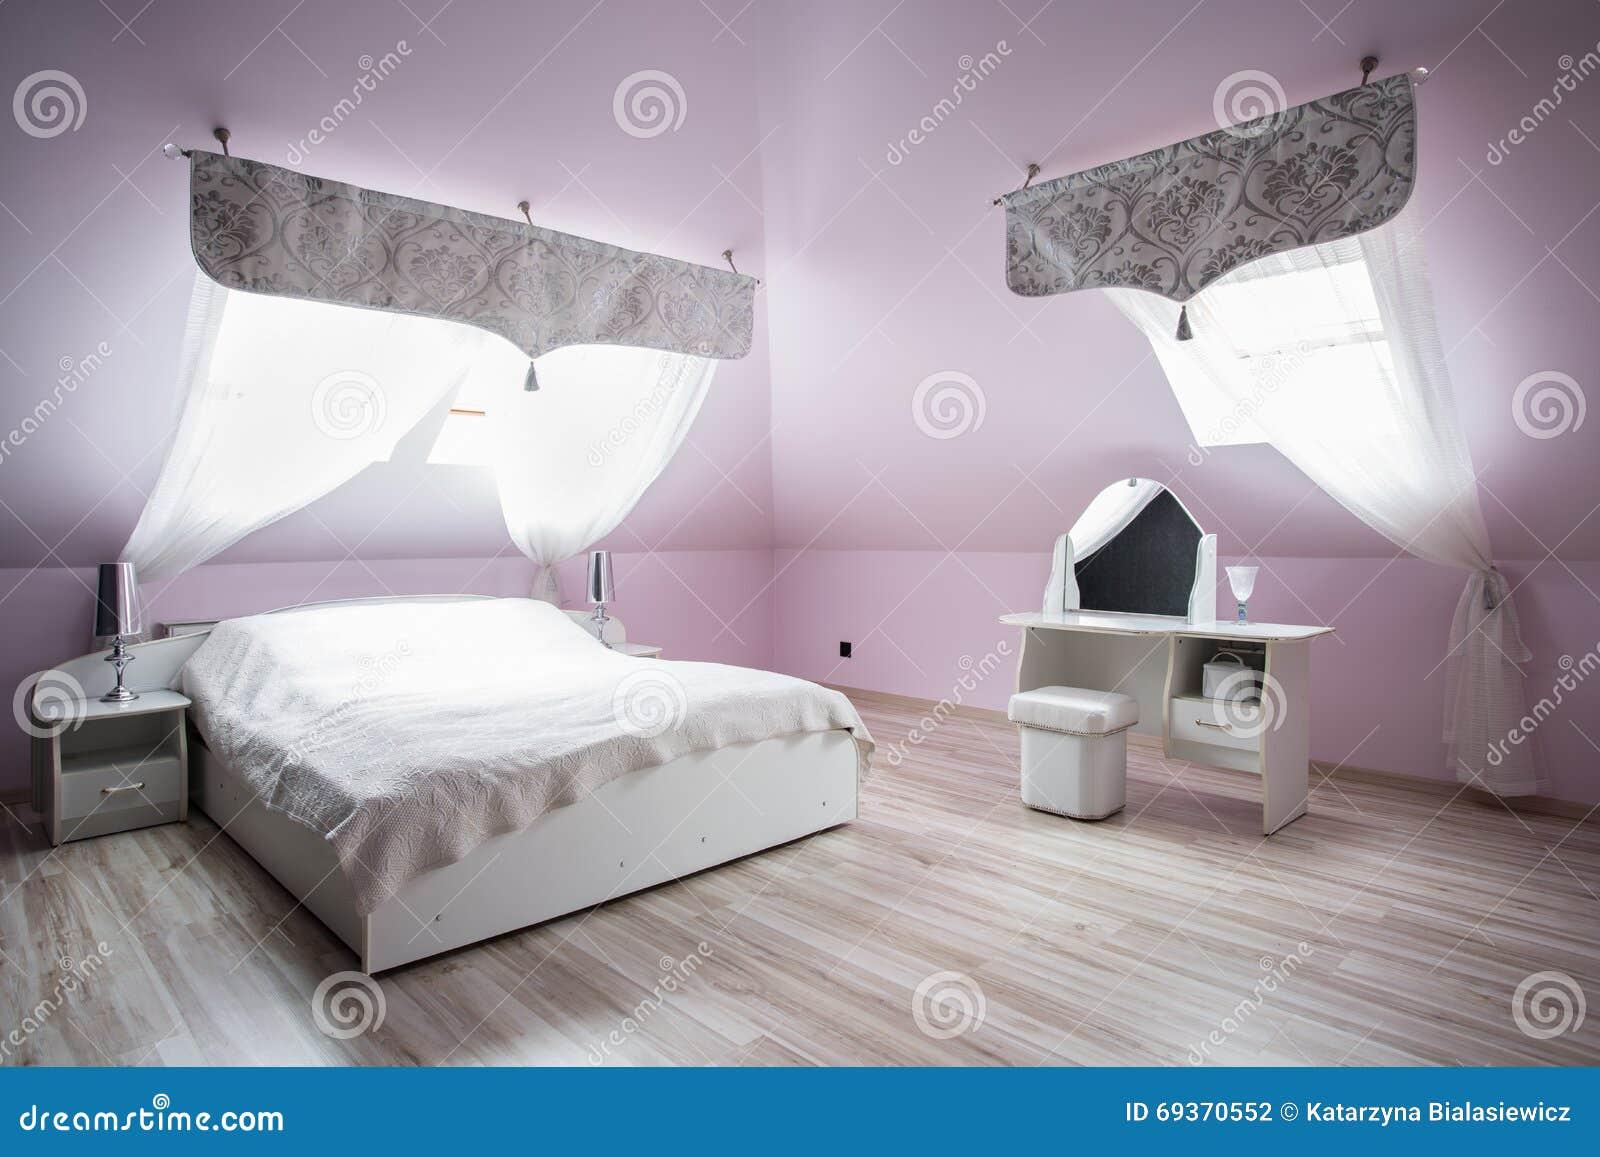 Bedroom For Romantic Couple Stock Photo Image 69370552